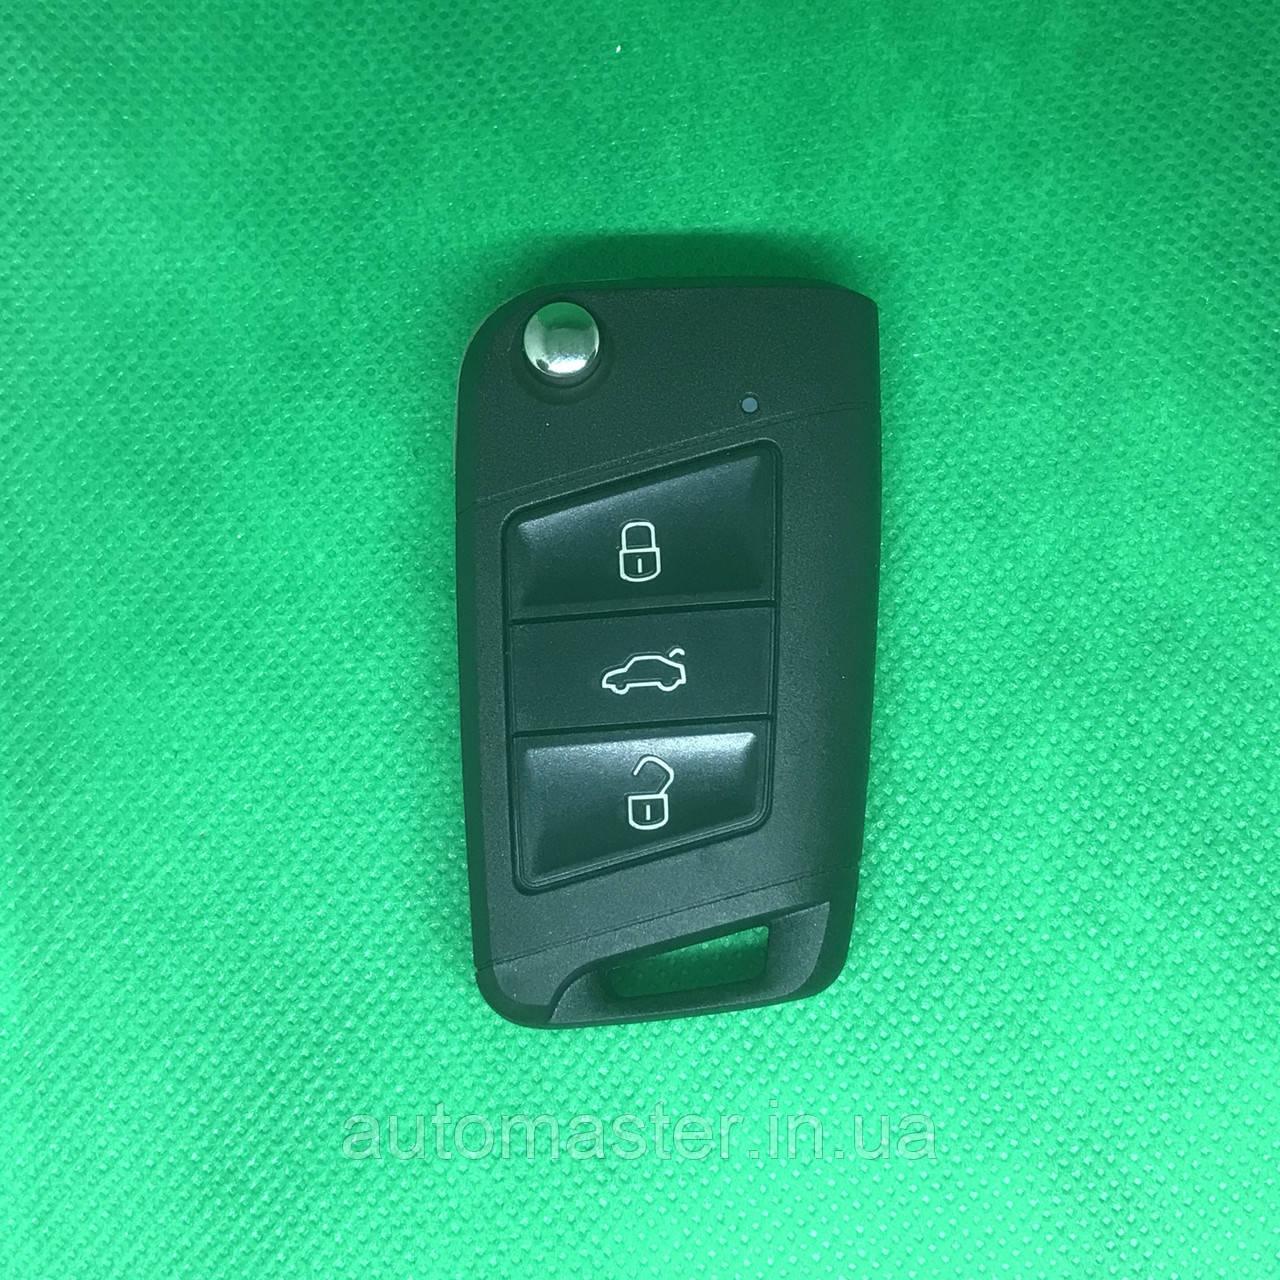 Ключ новый стиль Фольксваген Volkswagen Caddy,Polo,Jetta  3 кнопки  5K0 959 753 AB, 5K0 837 202AD 433MHz,ID48